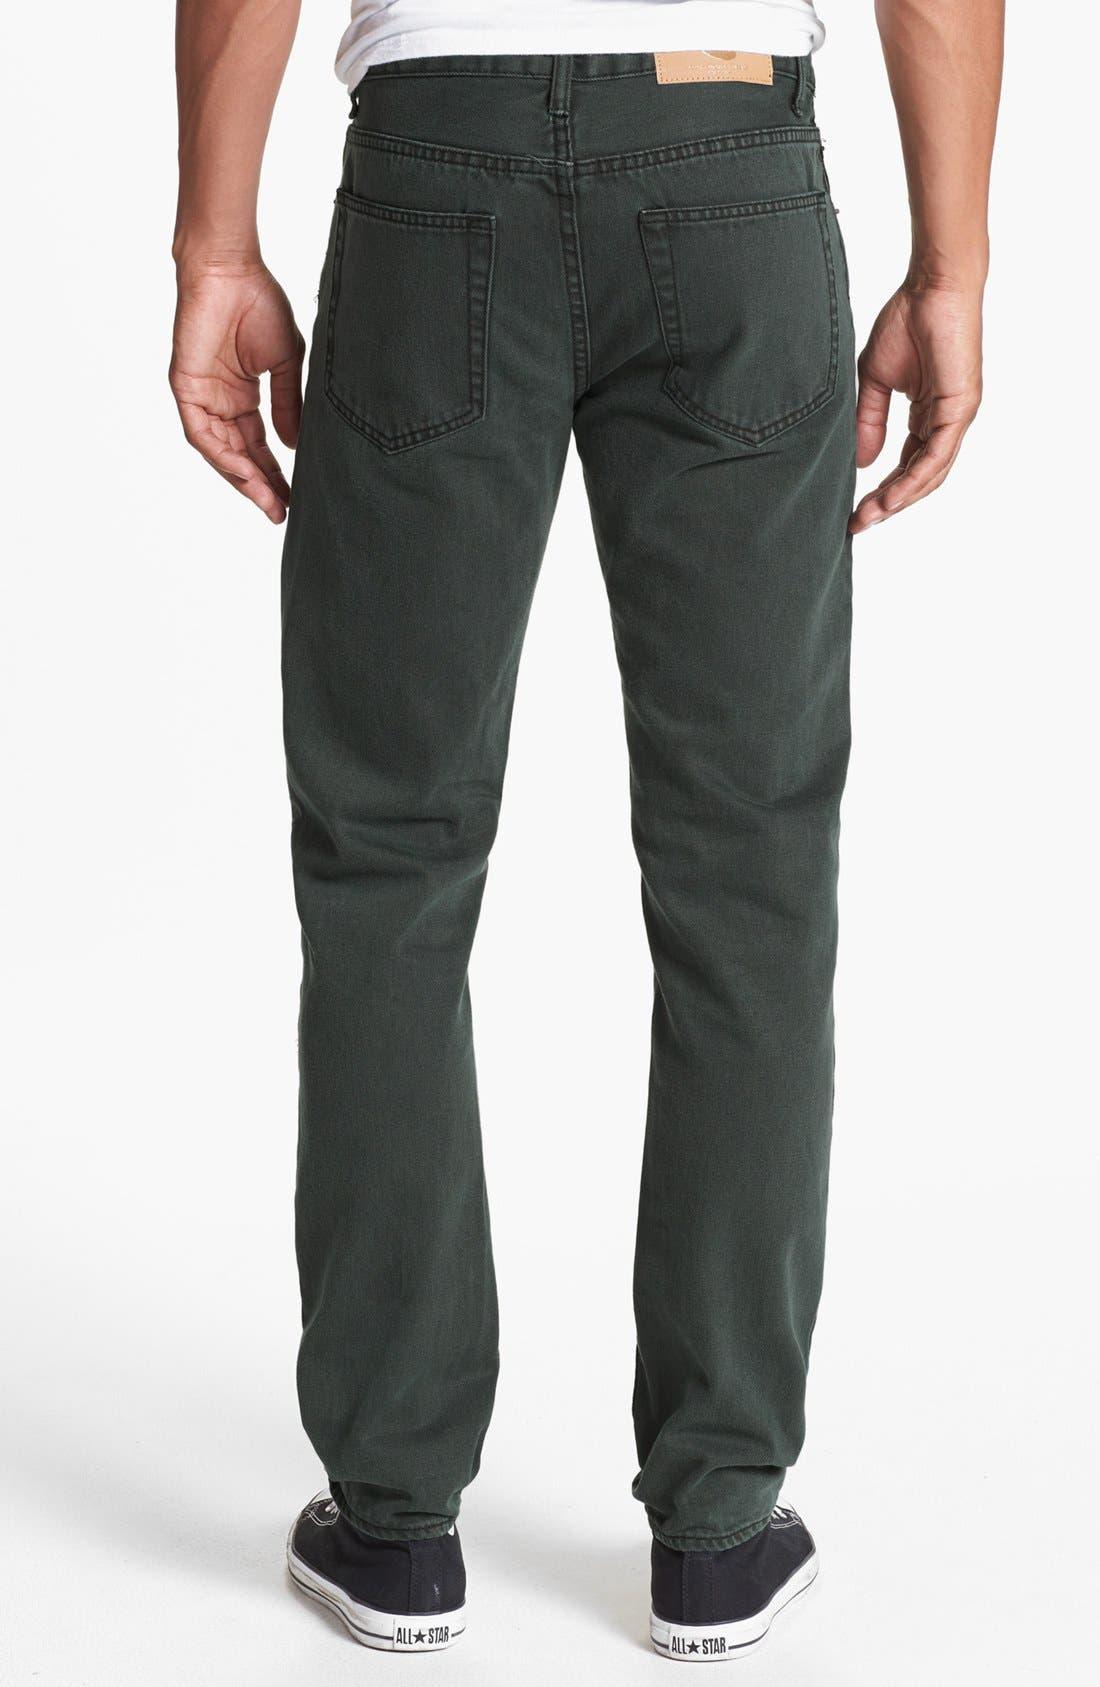 Alternate Image 1 Selected - Cheap Monday High Slim Straight Leg Jeans (Black Night)